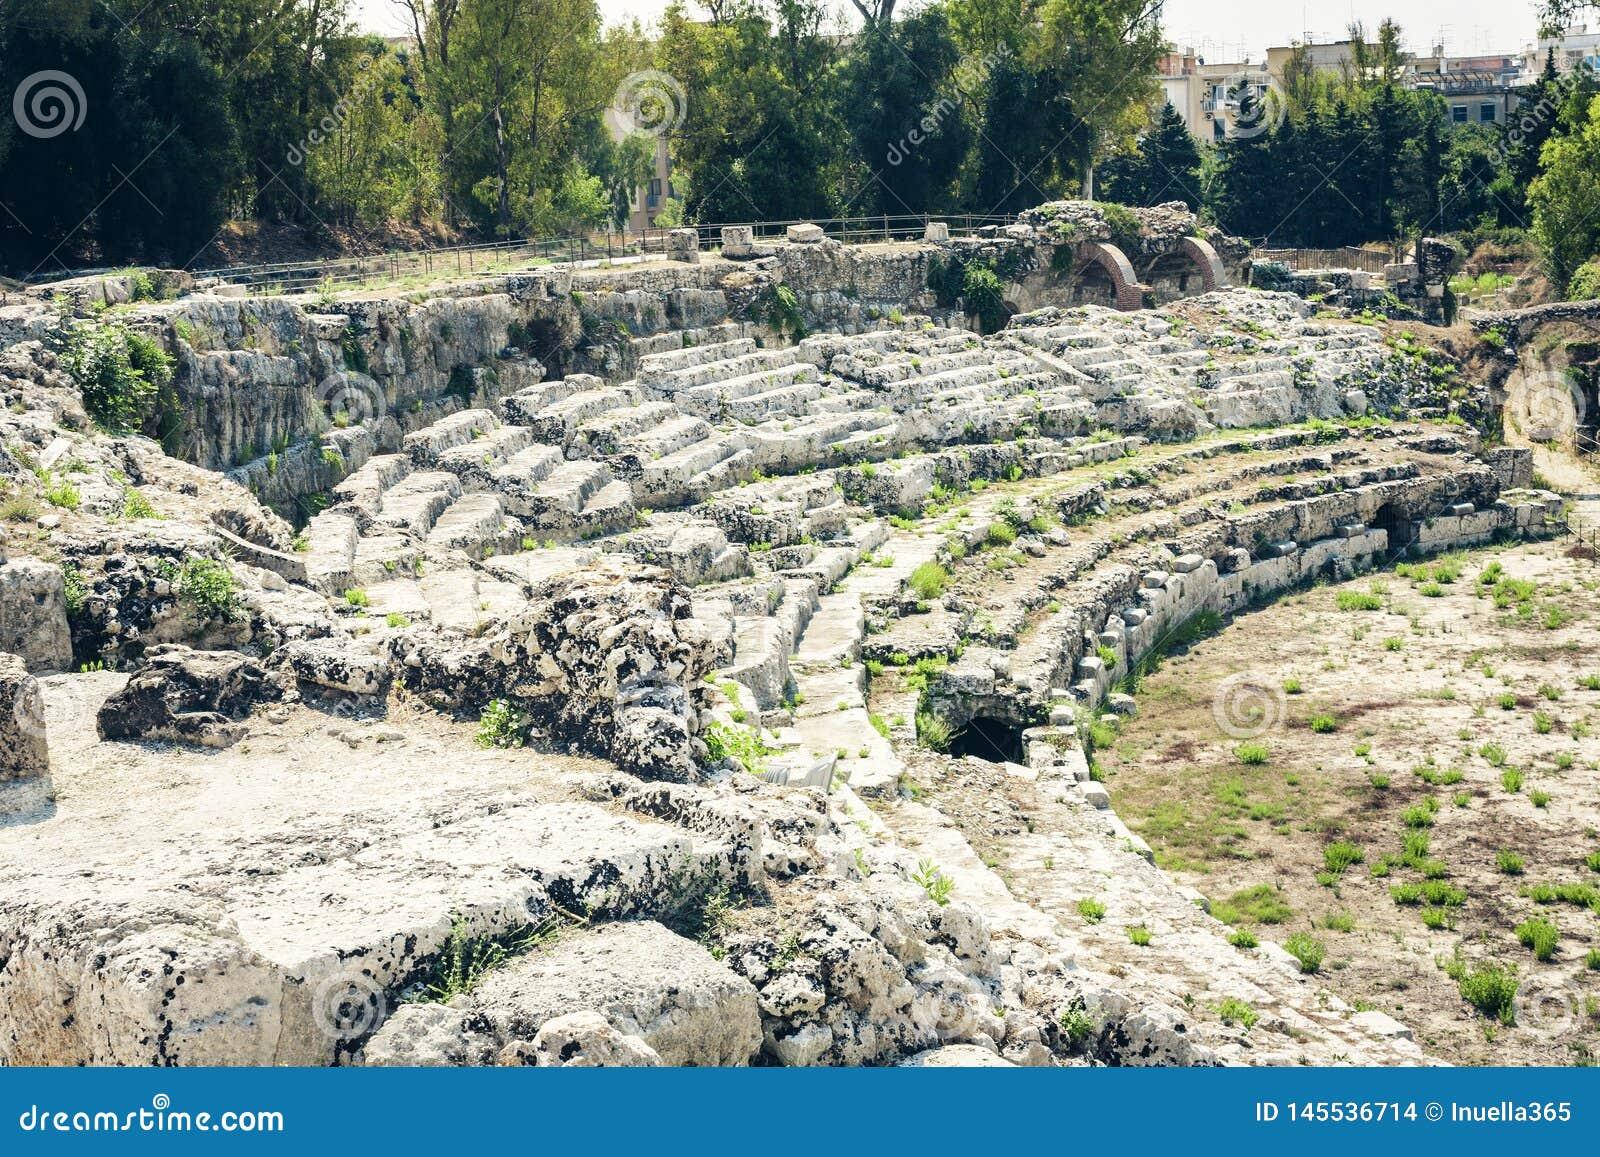 O anfiteatro romano ru?nas do ?? de Siracusa Siracusa ?no parque arqueol?gico, Sic?lia, It?lia